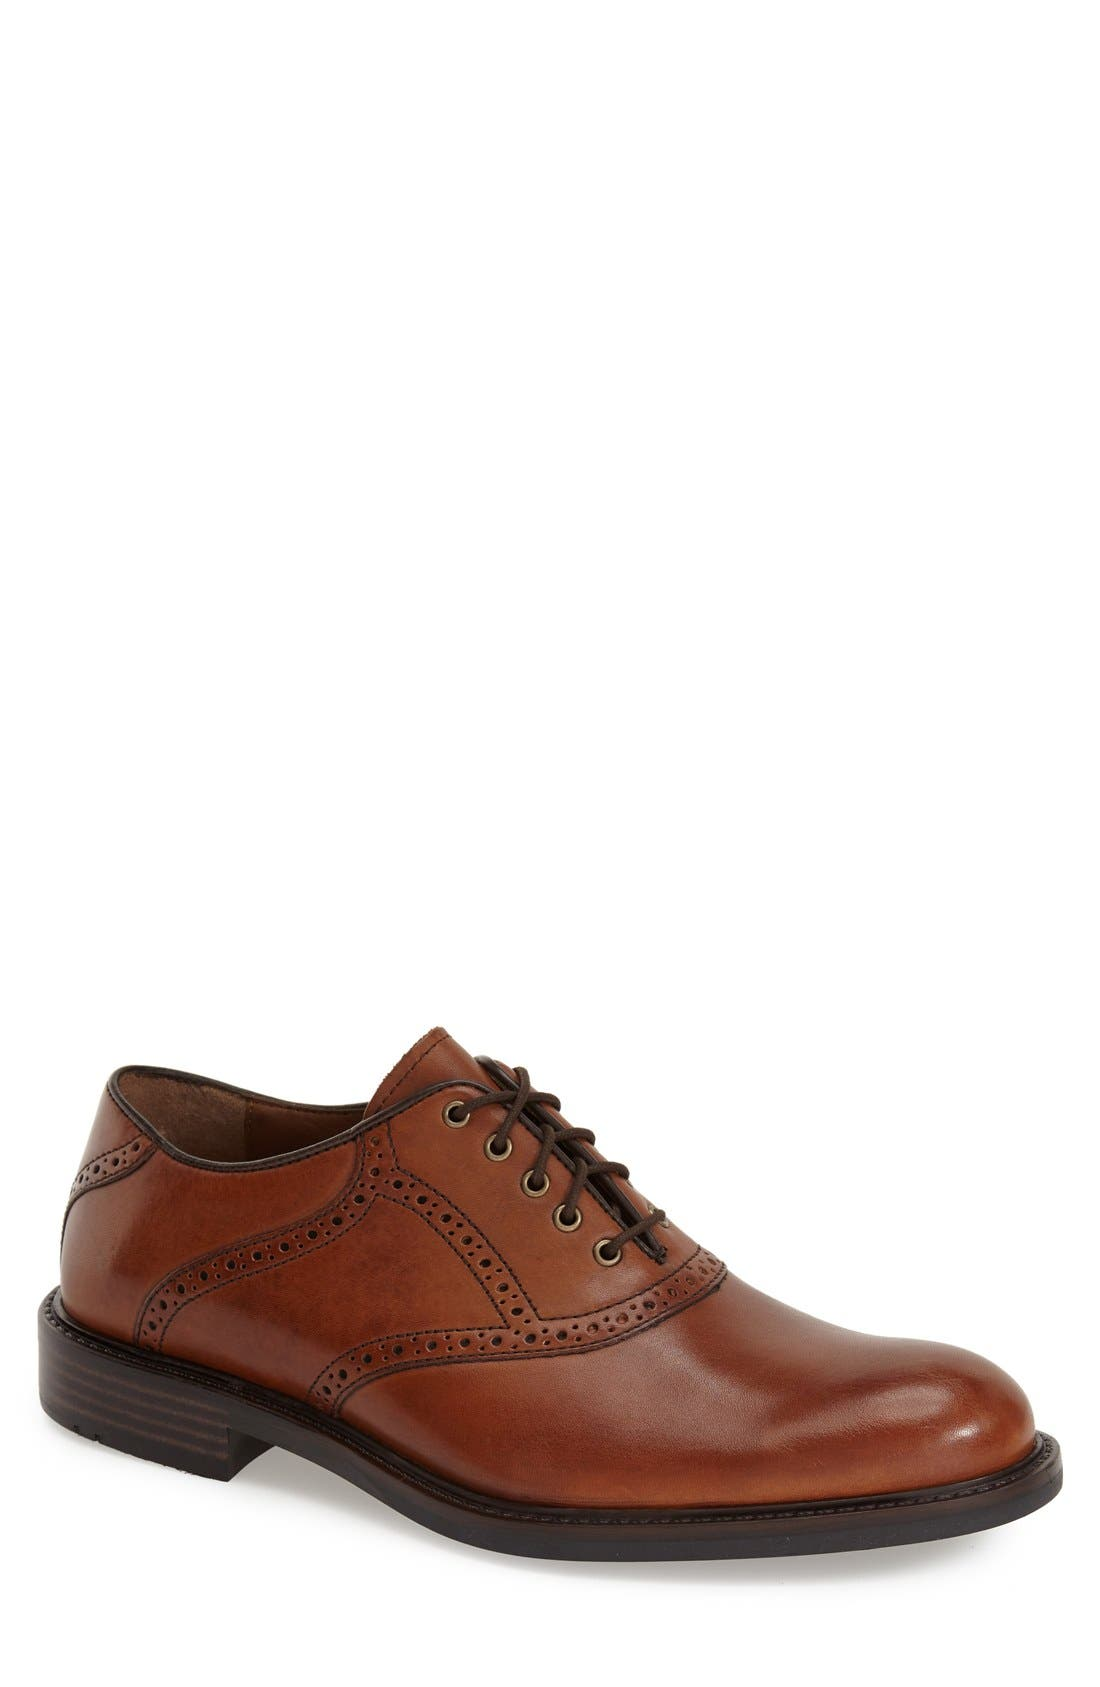 'Tabor' Saddle Shoe,                             Main thumbnail 1, color,                             Mahogany